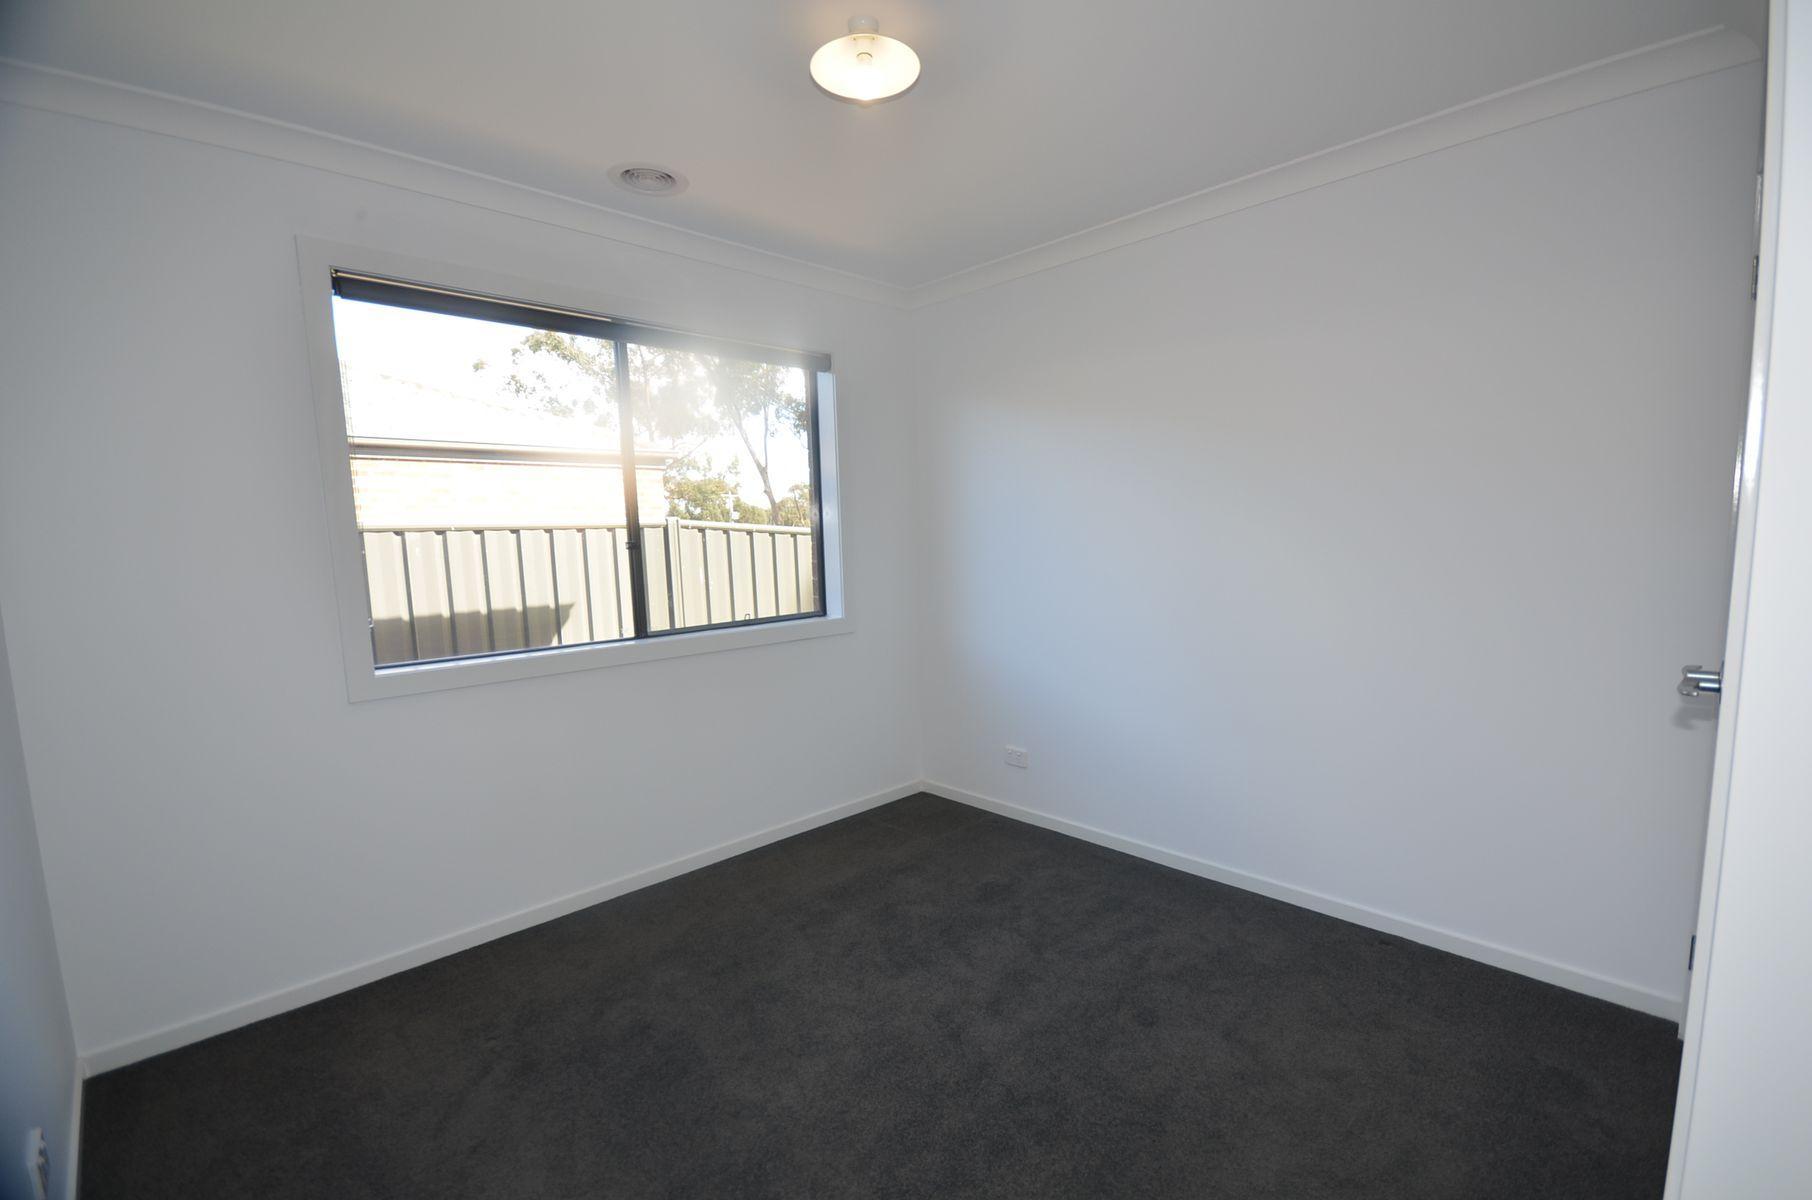 23 Bolitho Terrace, Maiden Gully, VIC 3551